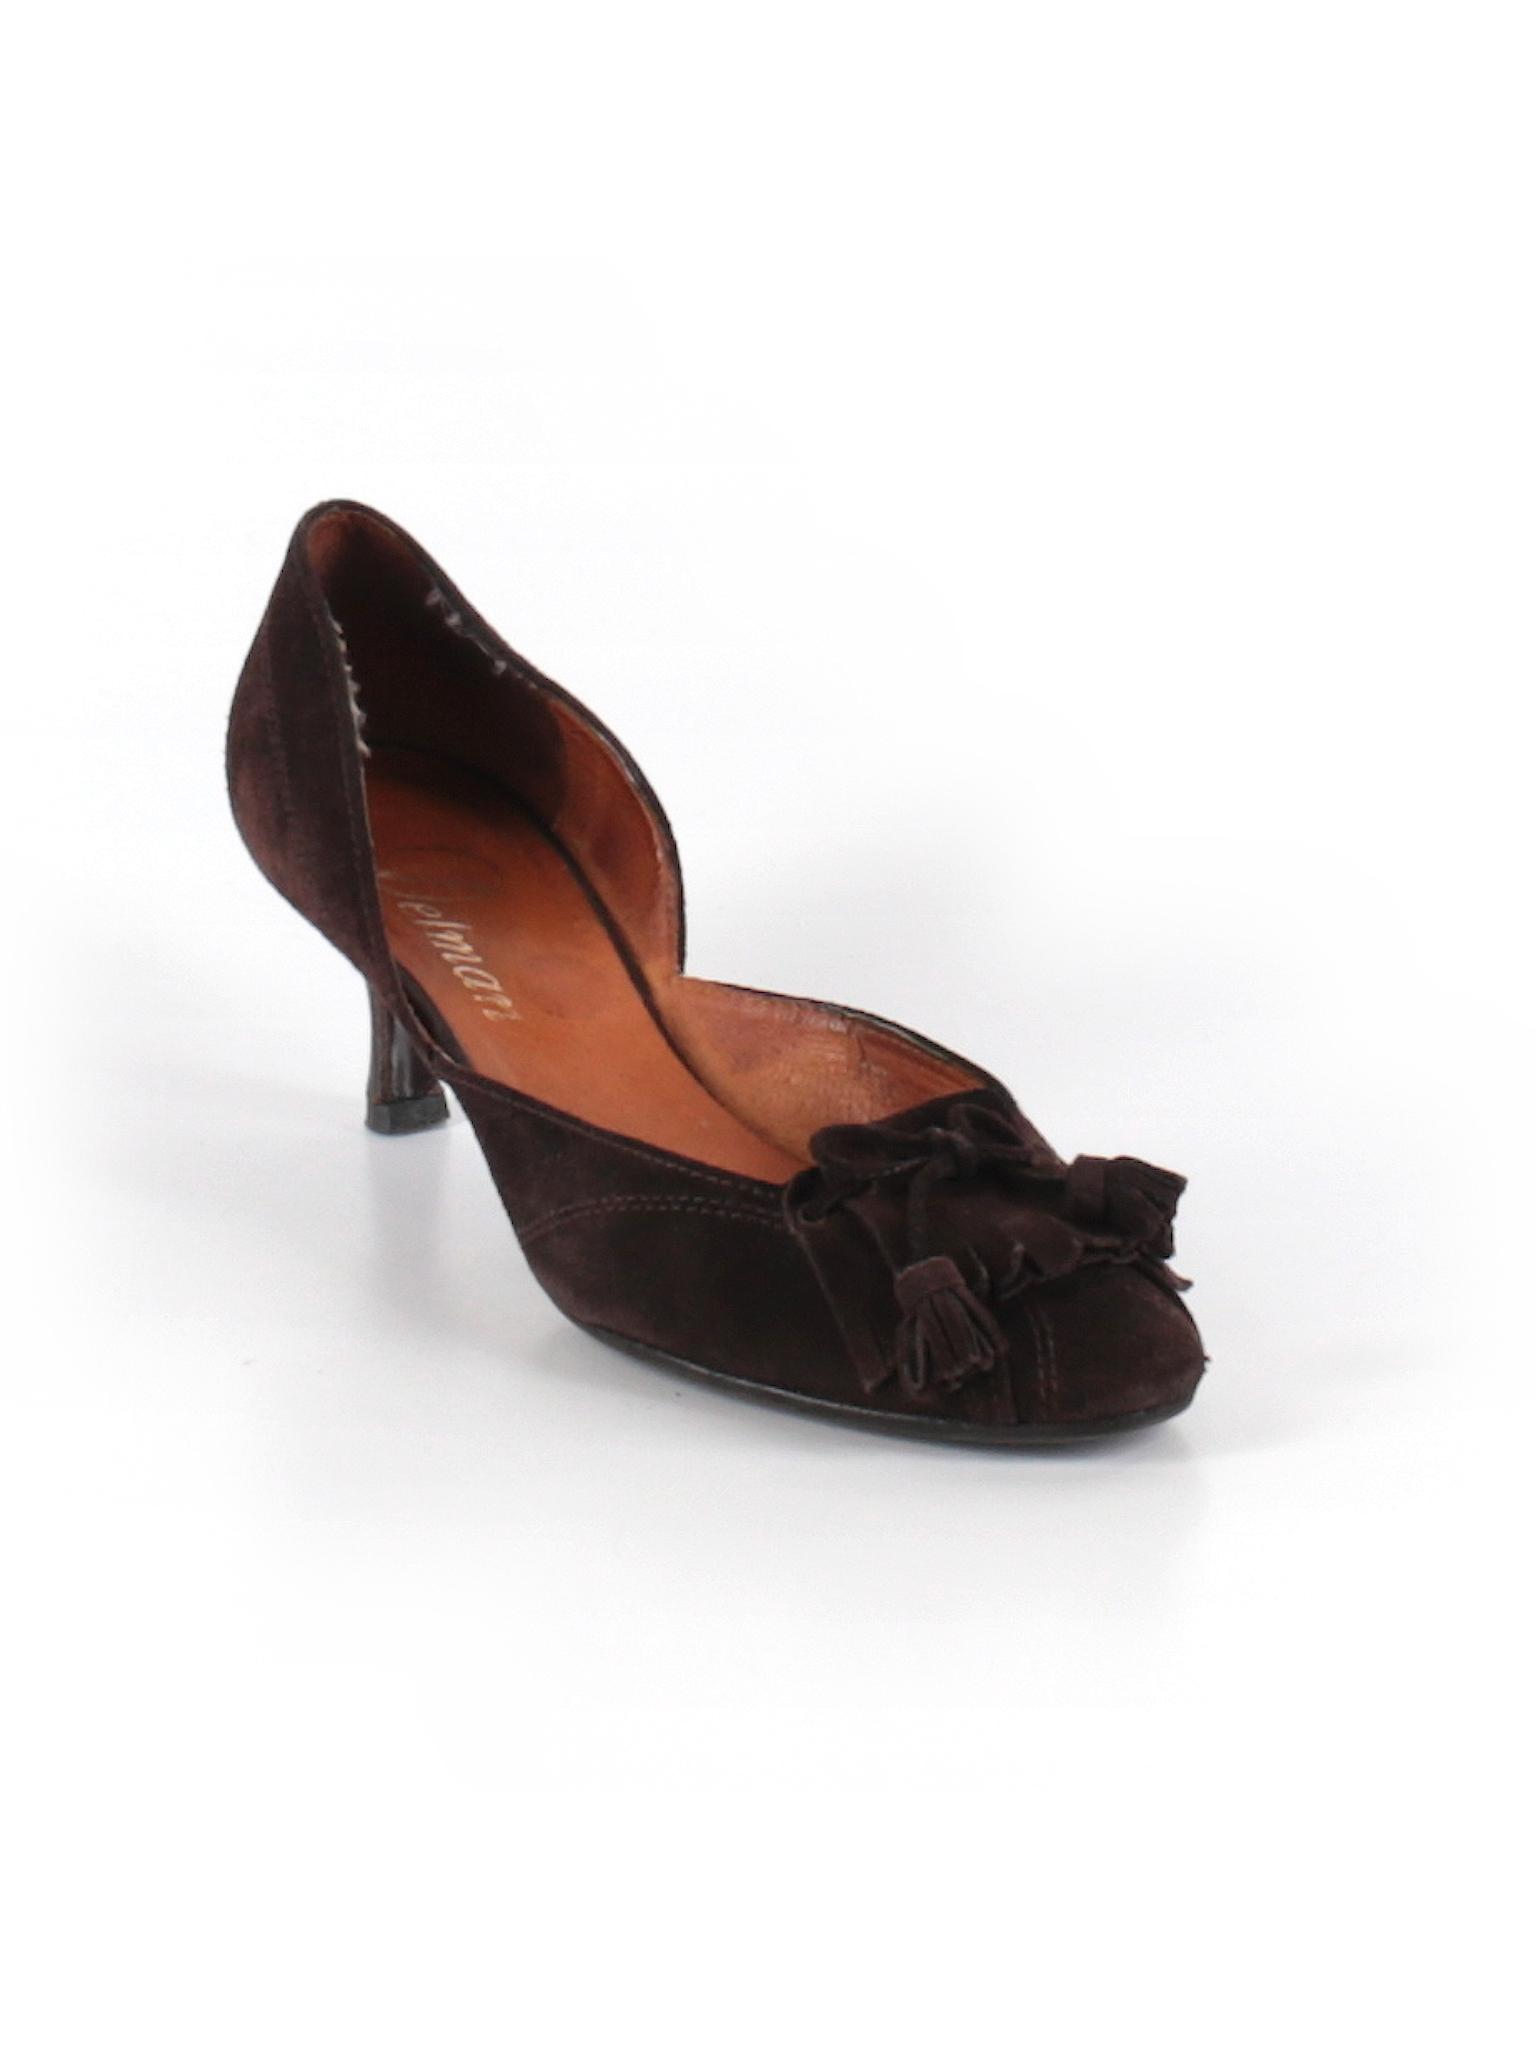 Delman Shoe Sizing